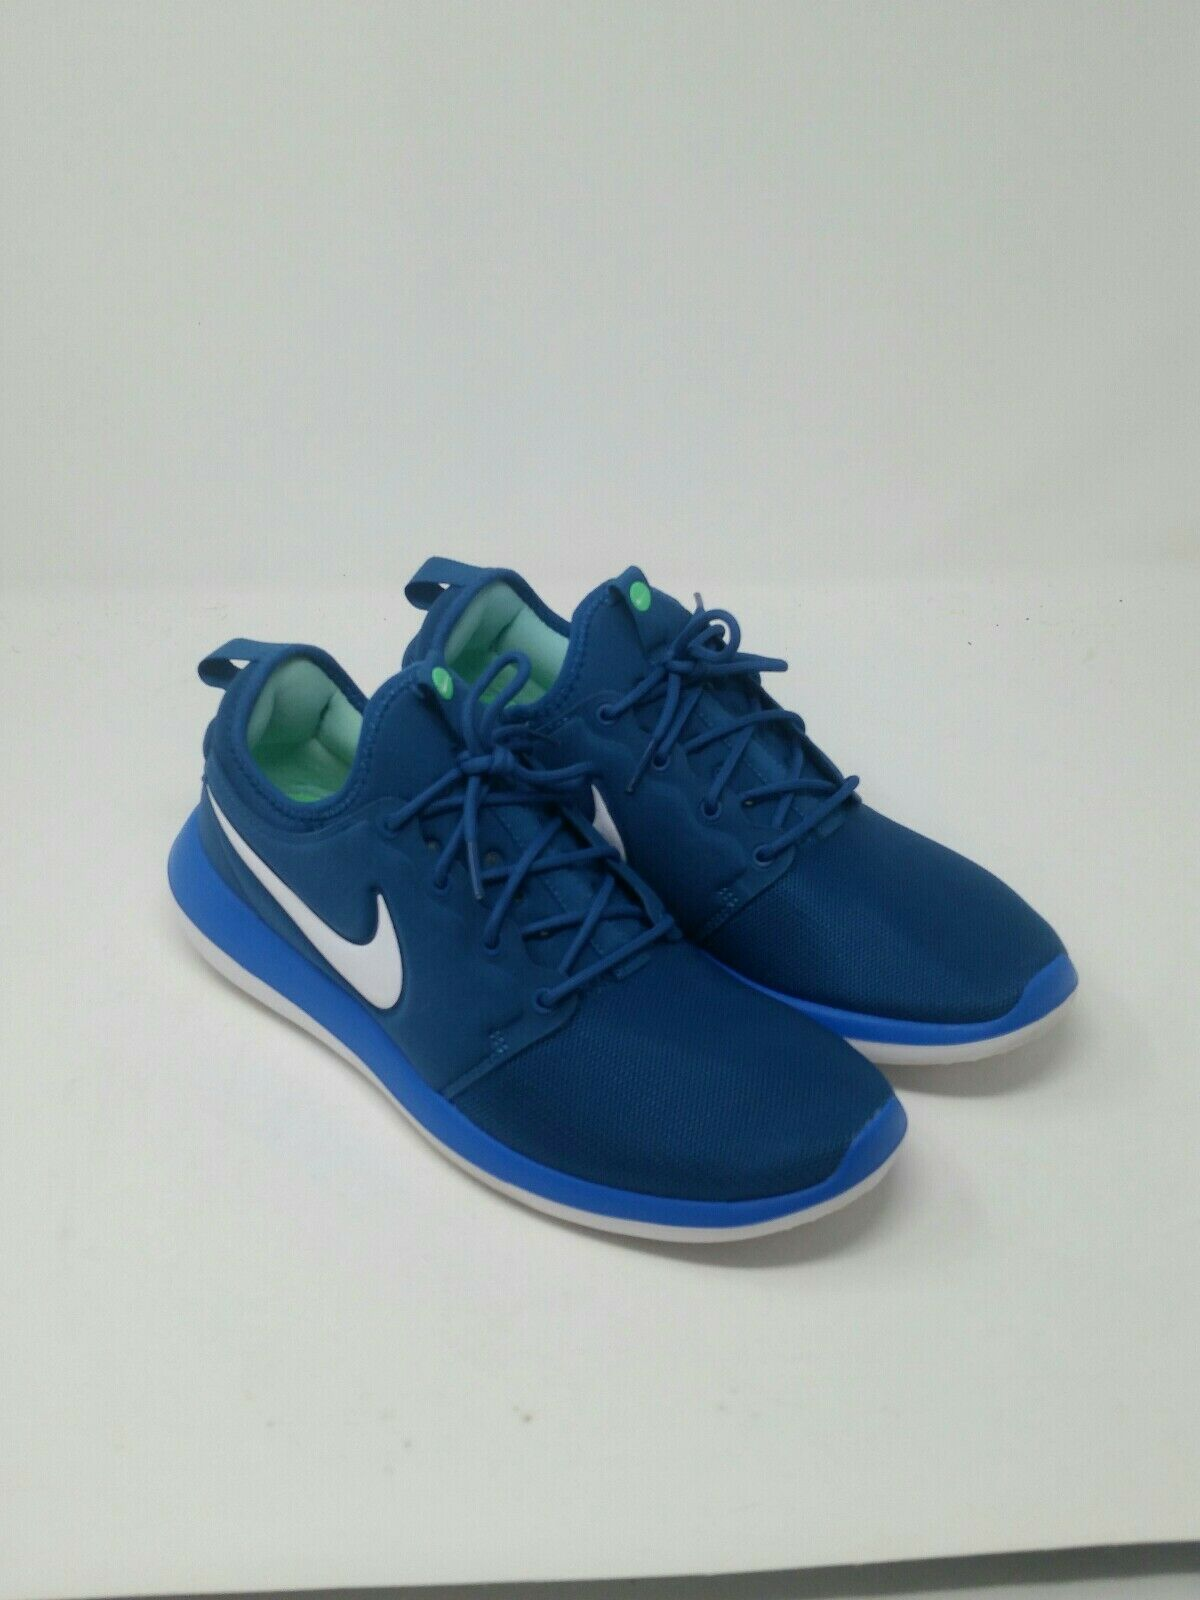 Nike Men's Roshe Two Running shoes Industrial bluee White Size 10 US